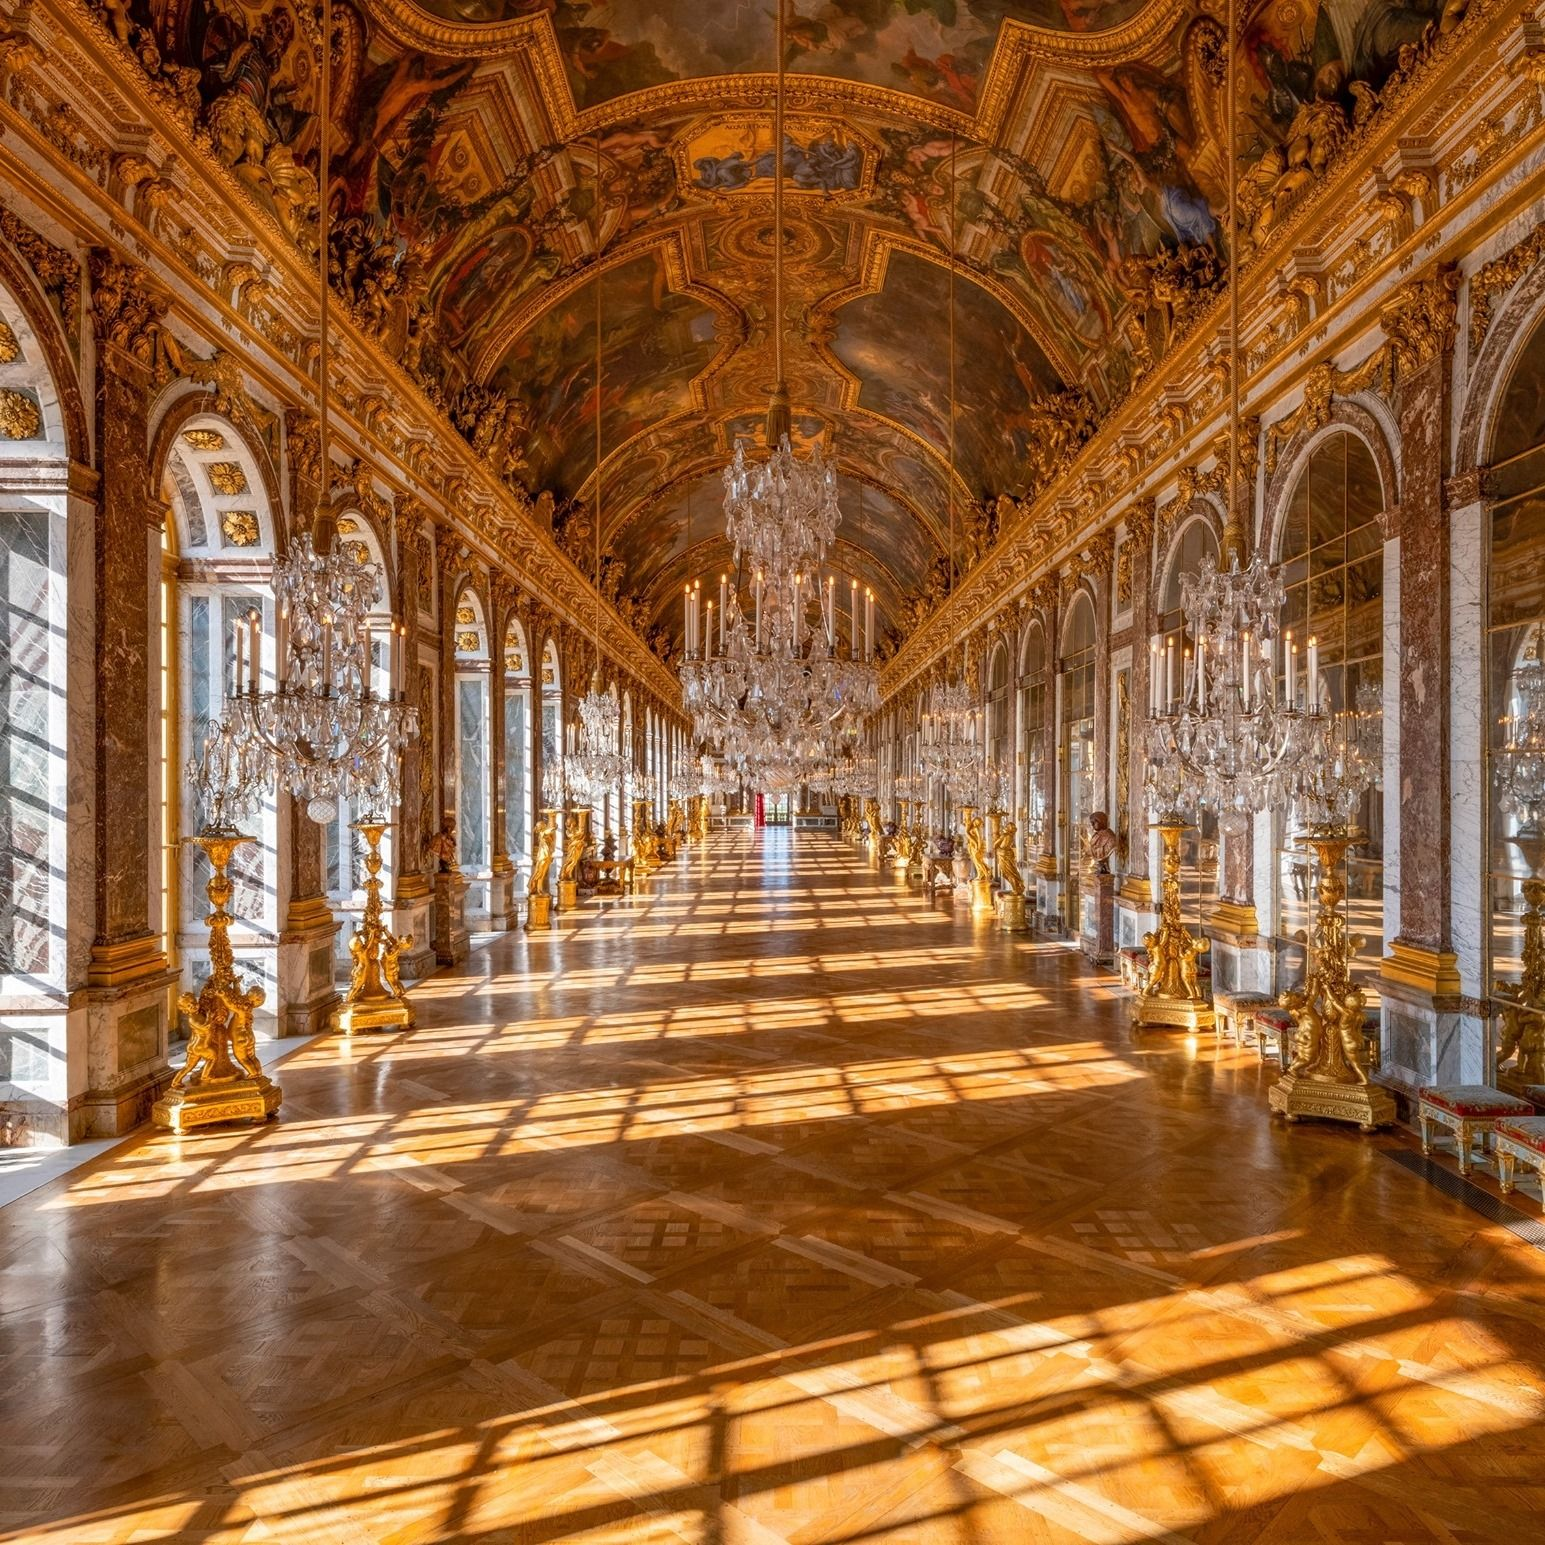 Travel Like Royalty The Palace Of Versailles Opens Its First Hotel Tatler Hong Kong